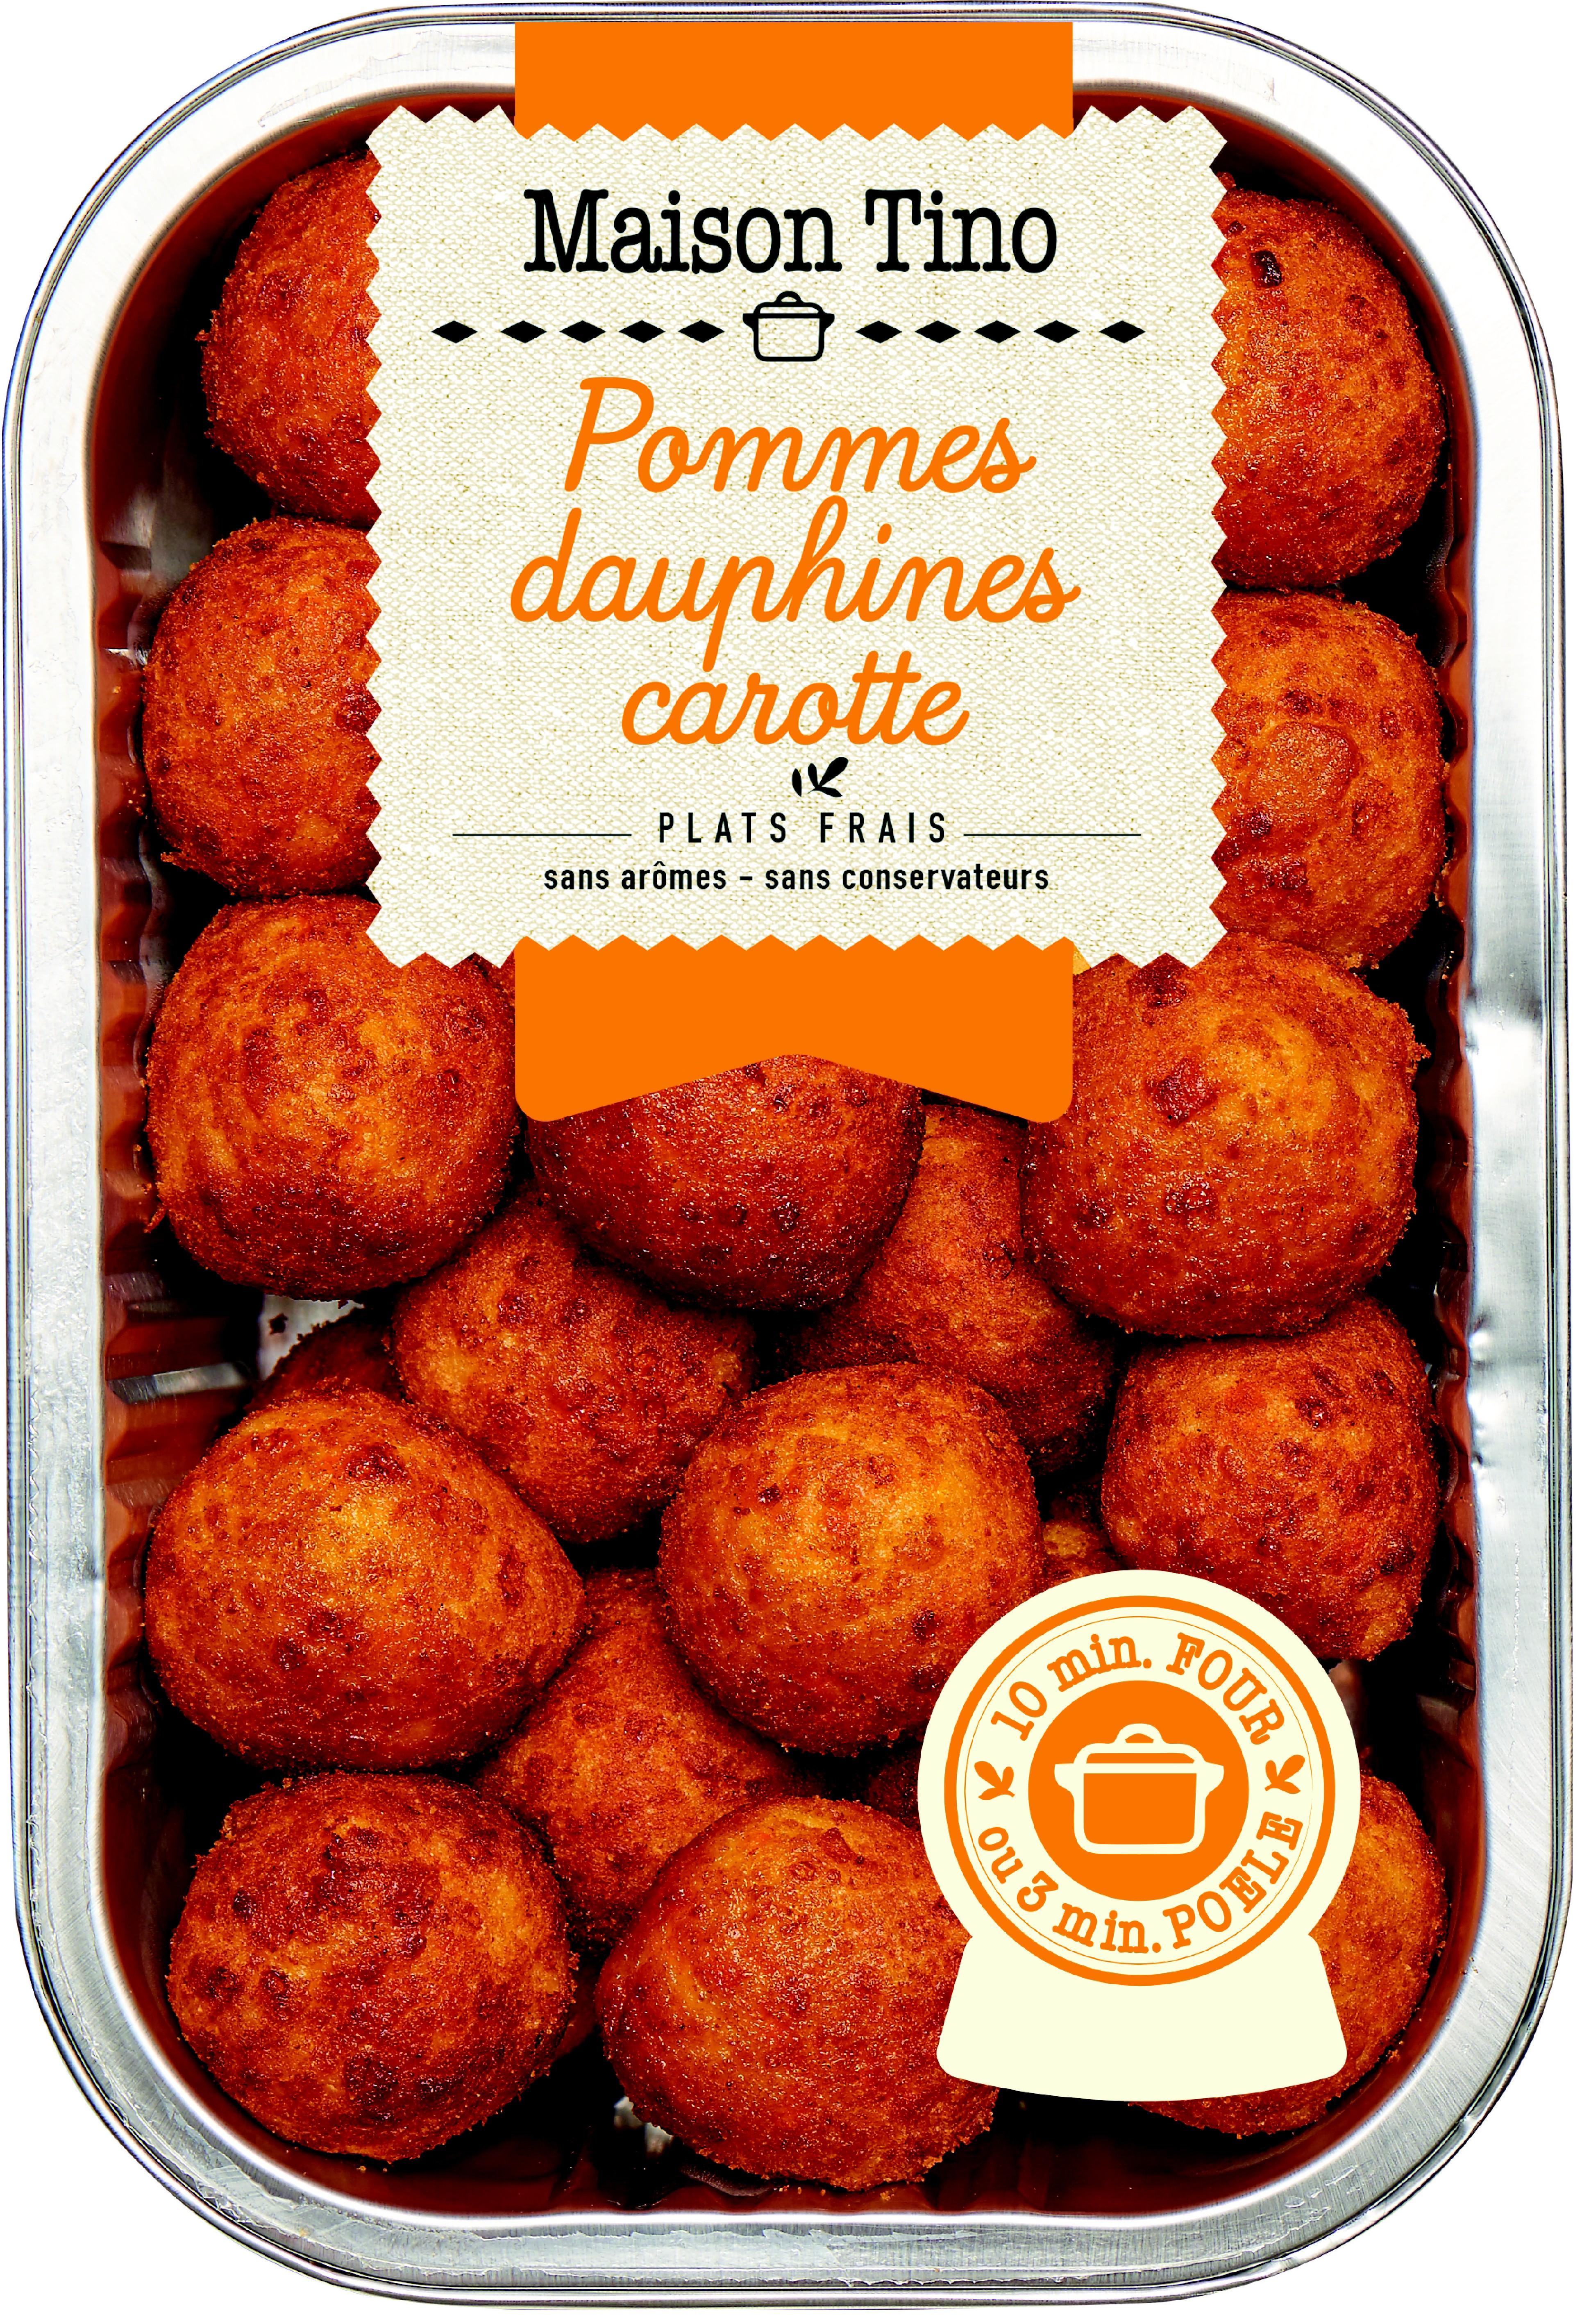 Pommes Dauphines Carottes, Maison Tino (500 g)